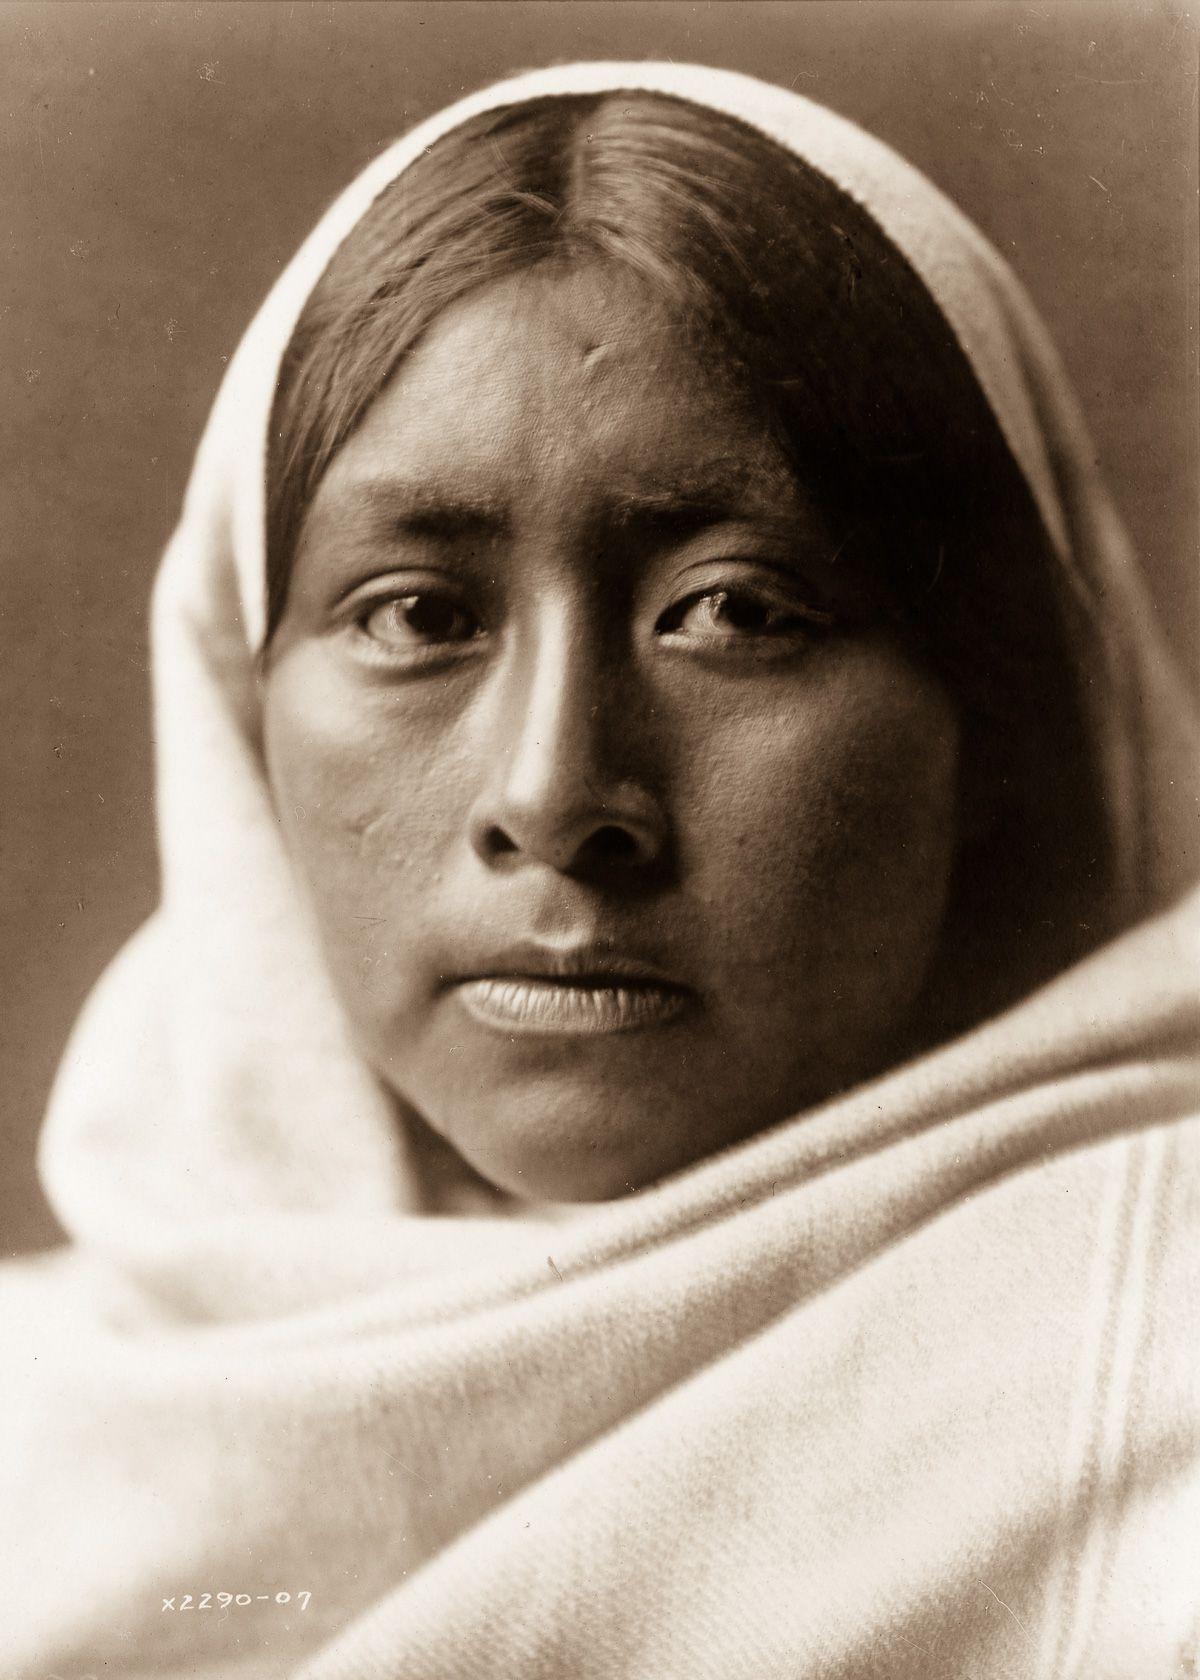 A Papago woman,  1907.  ©EDWARD S. CURTIS/LIBRARY OF CONGRESS